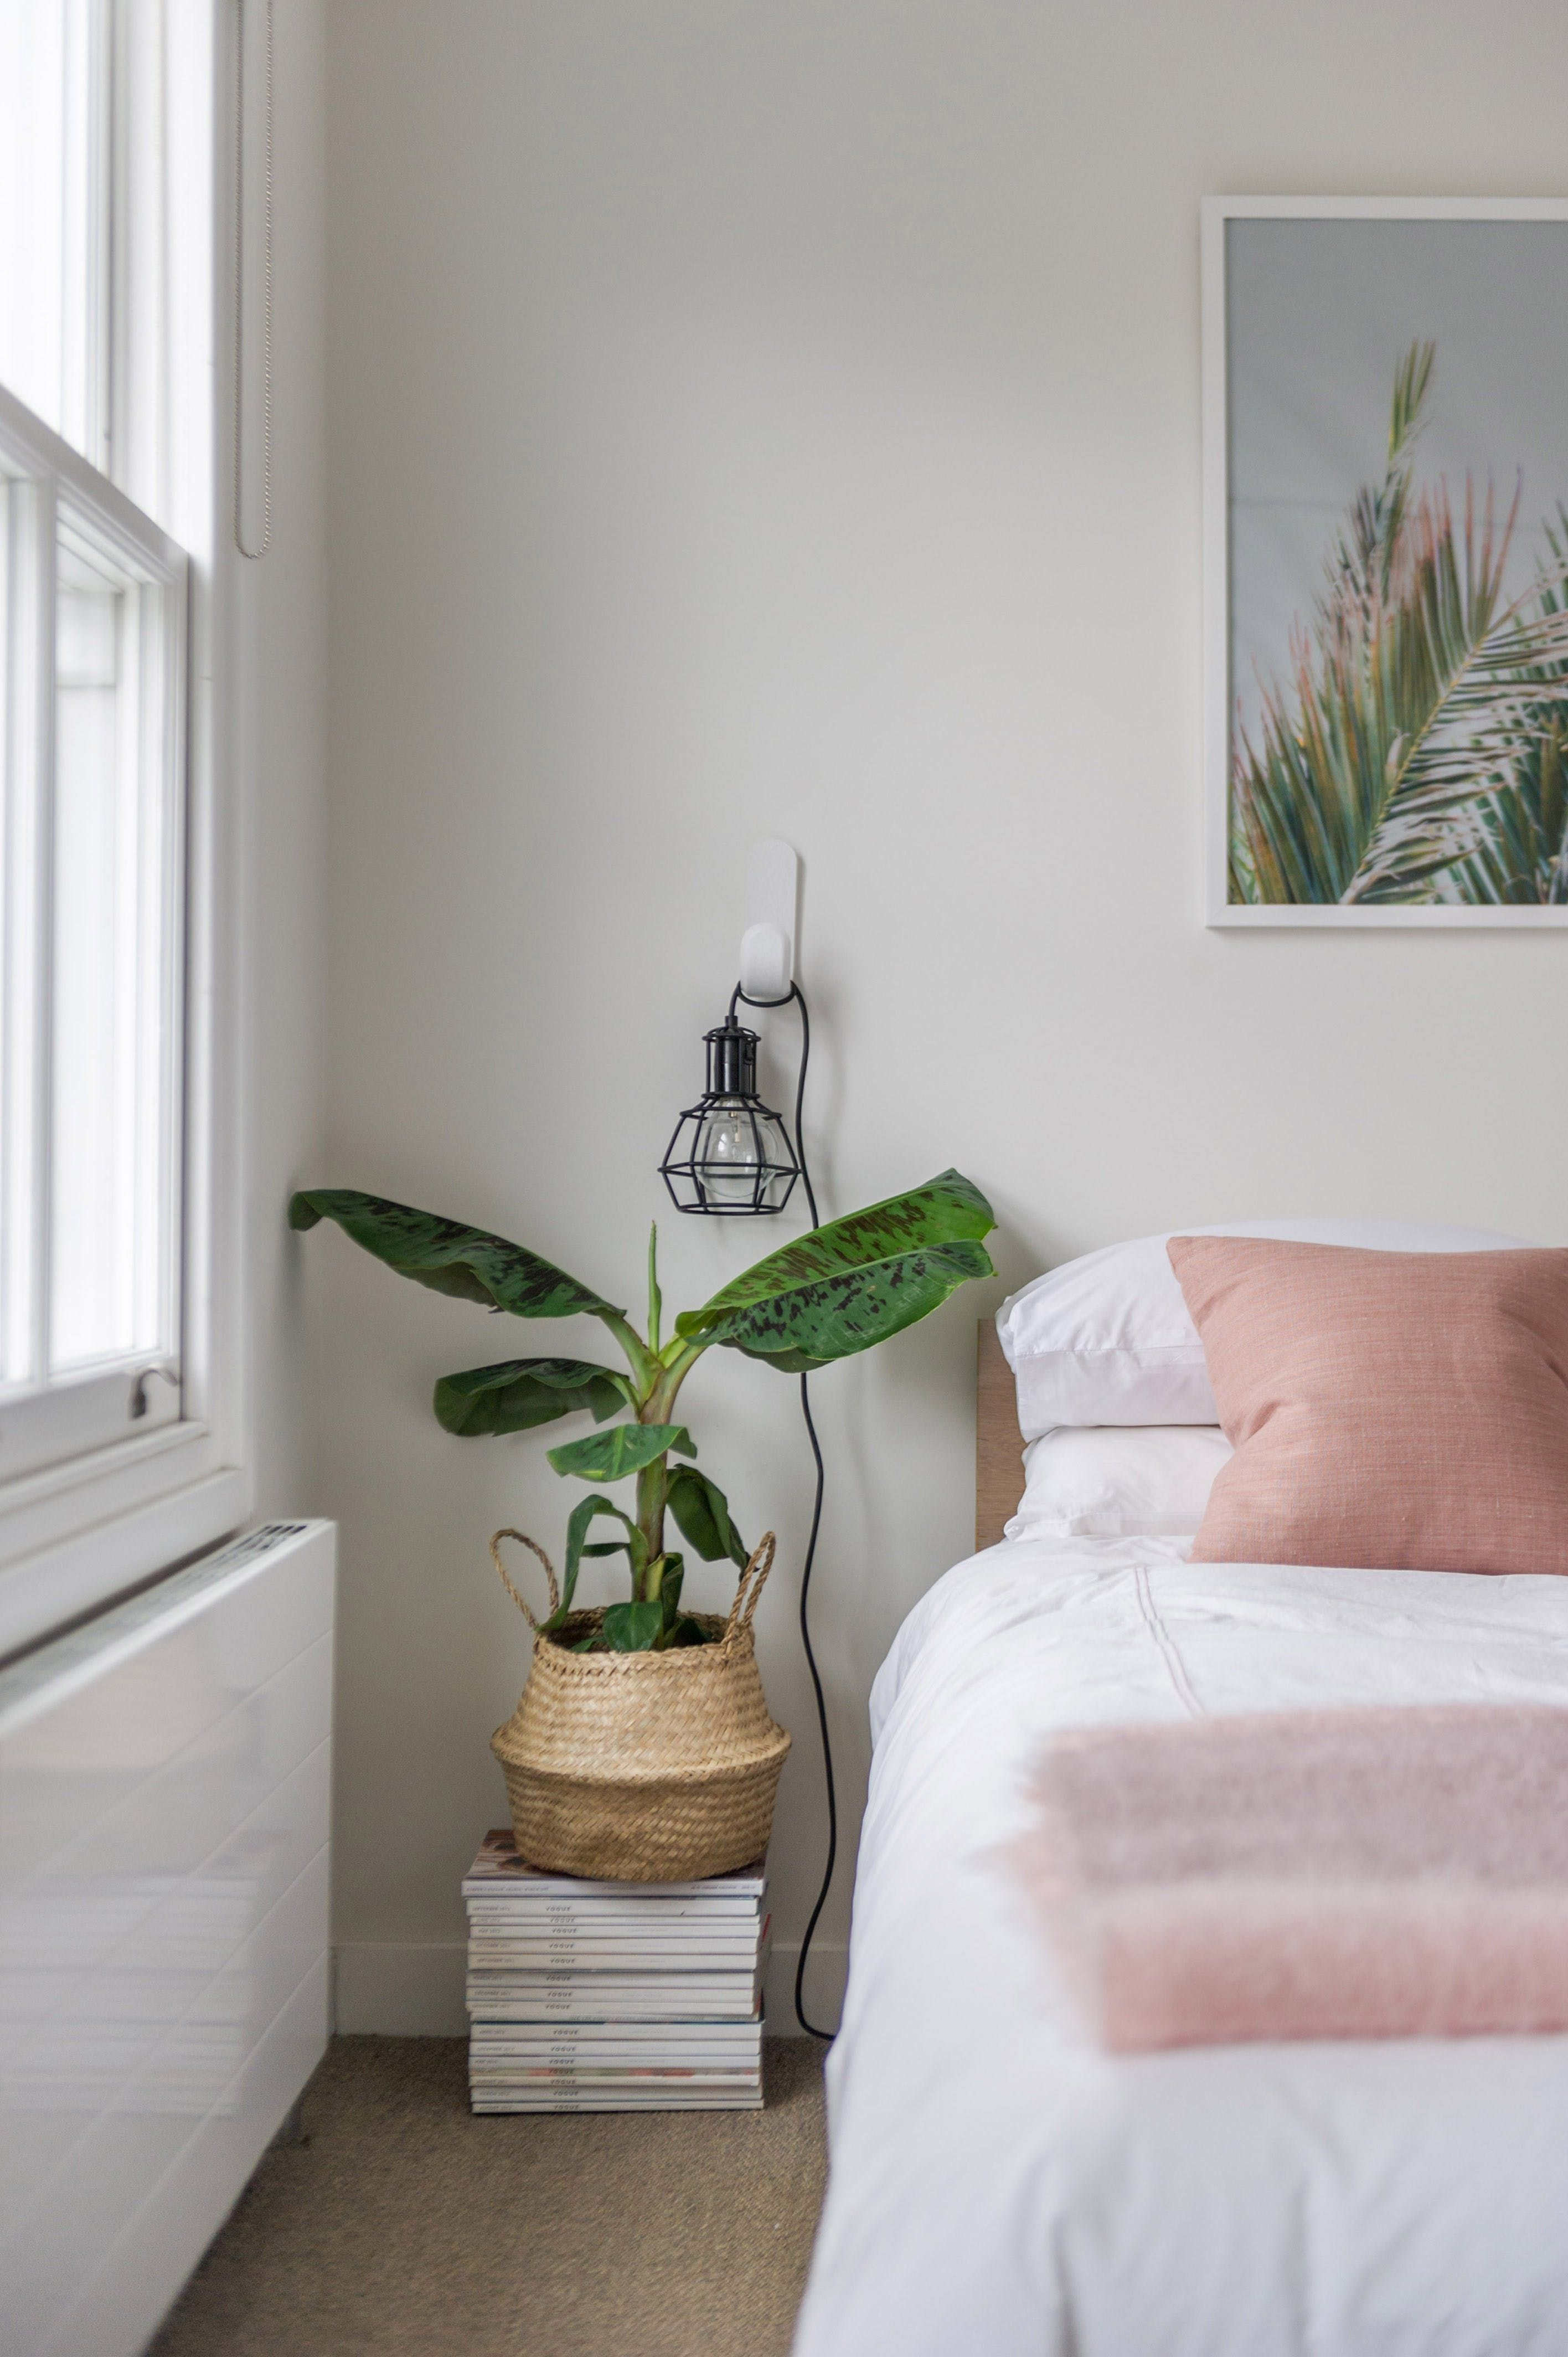 Interior design for double bedroom flat tour a run down london studio turned twobedroom flat  copenhagen